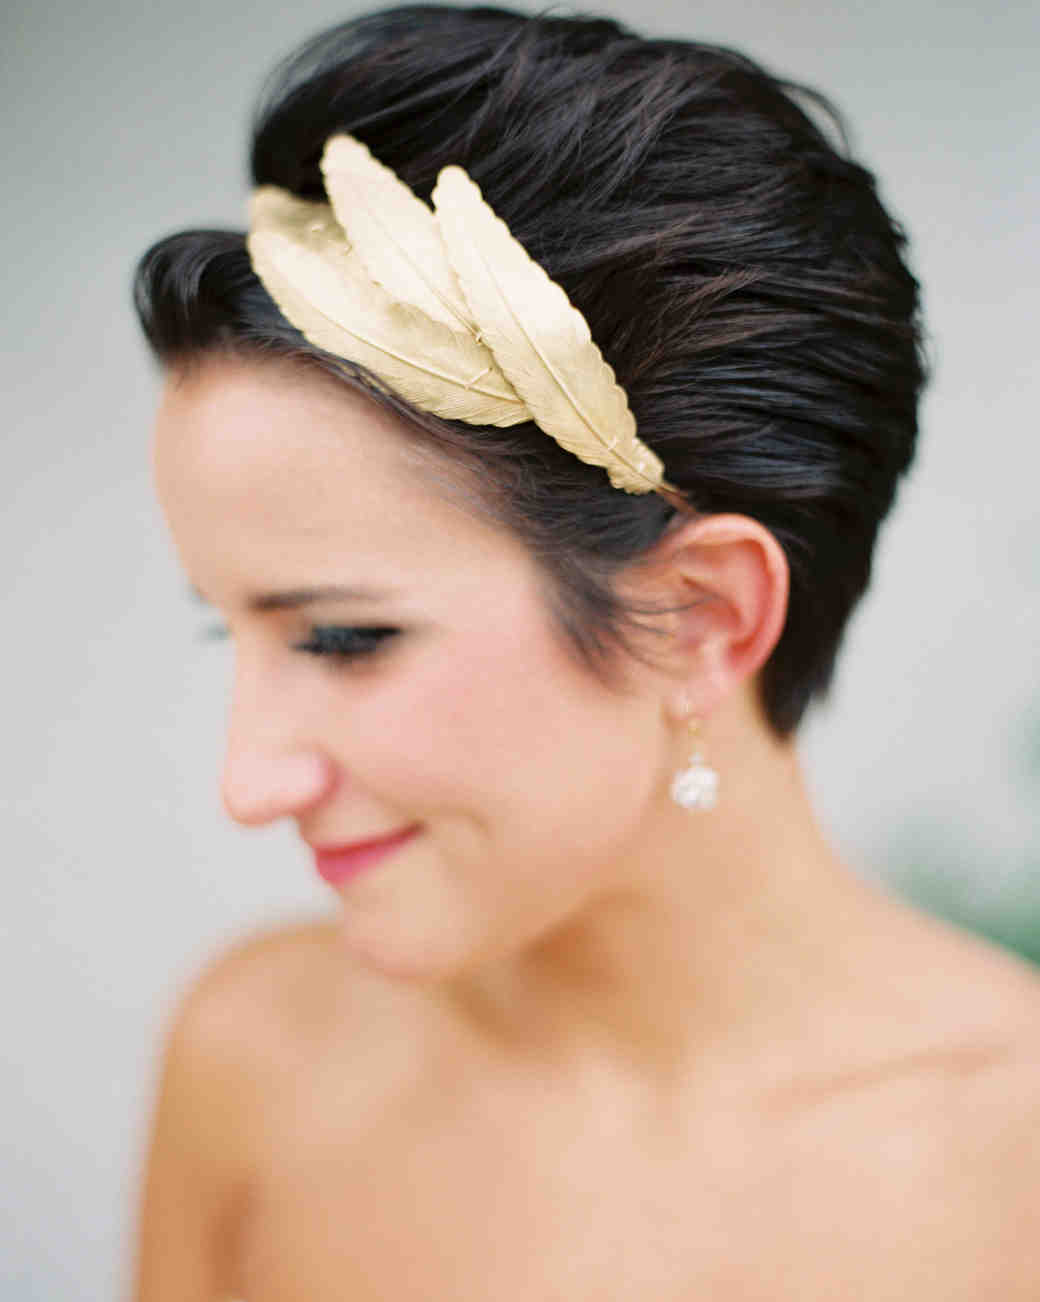 jessejo-daniel-wedding-headpiece-086-s112302-1015.jpg